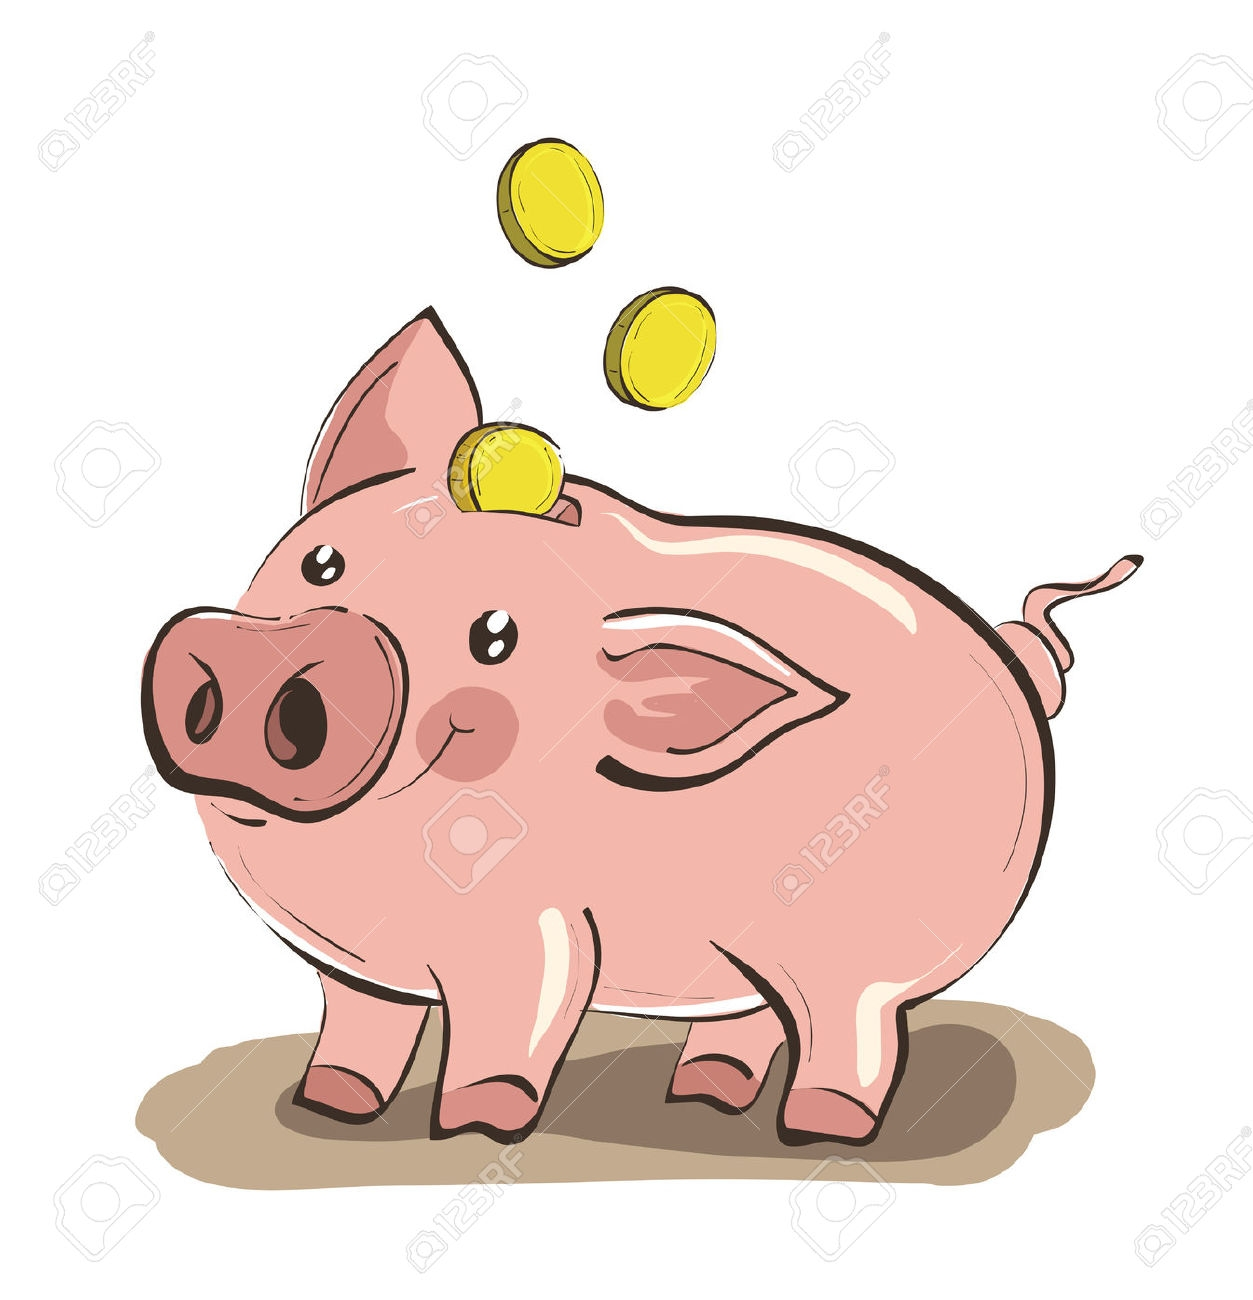 Piggy bank money clipart image freeuse Piggy Bank Money Clipart Clip art of Bank Clipart #5392 — Clipartwork image freeuse